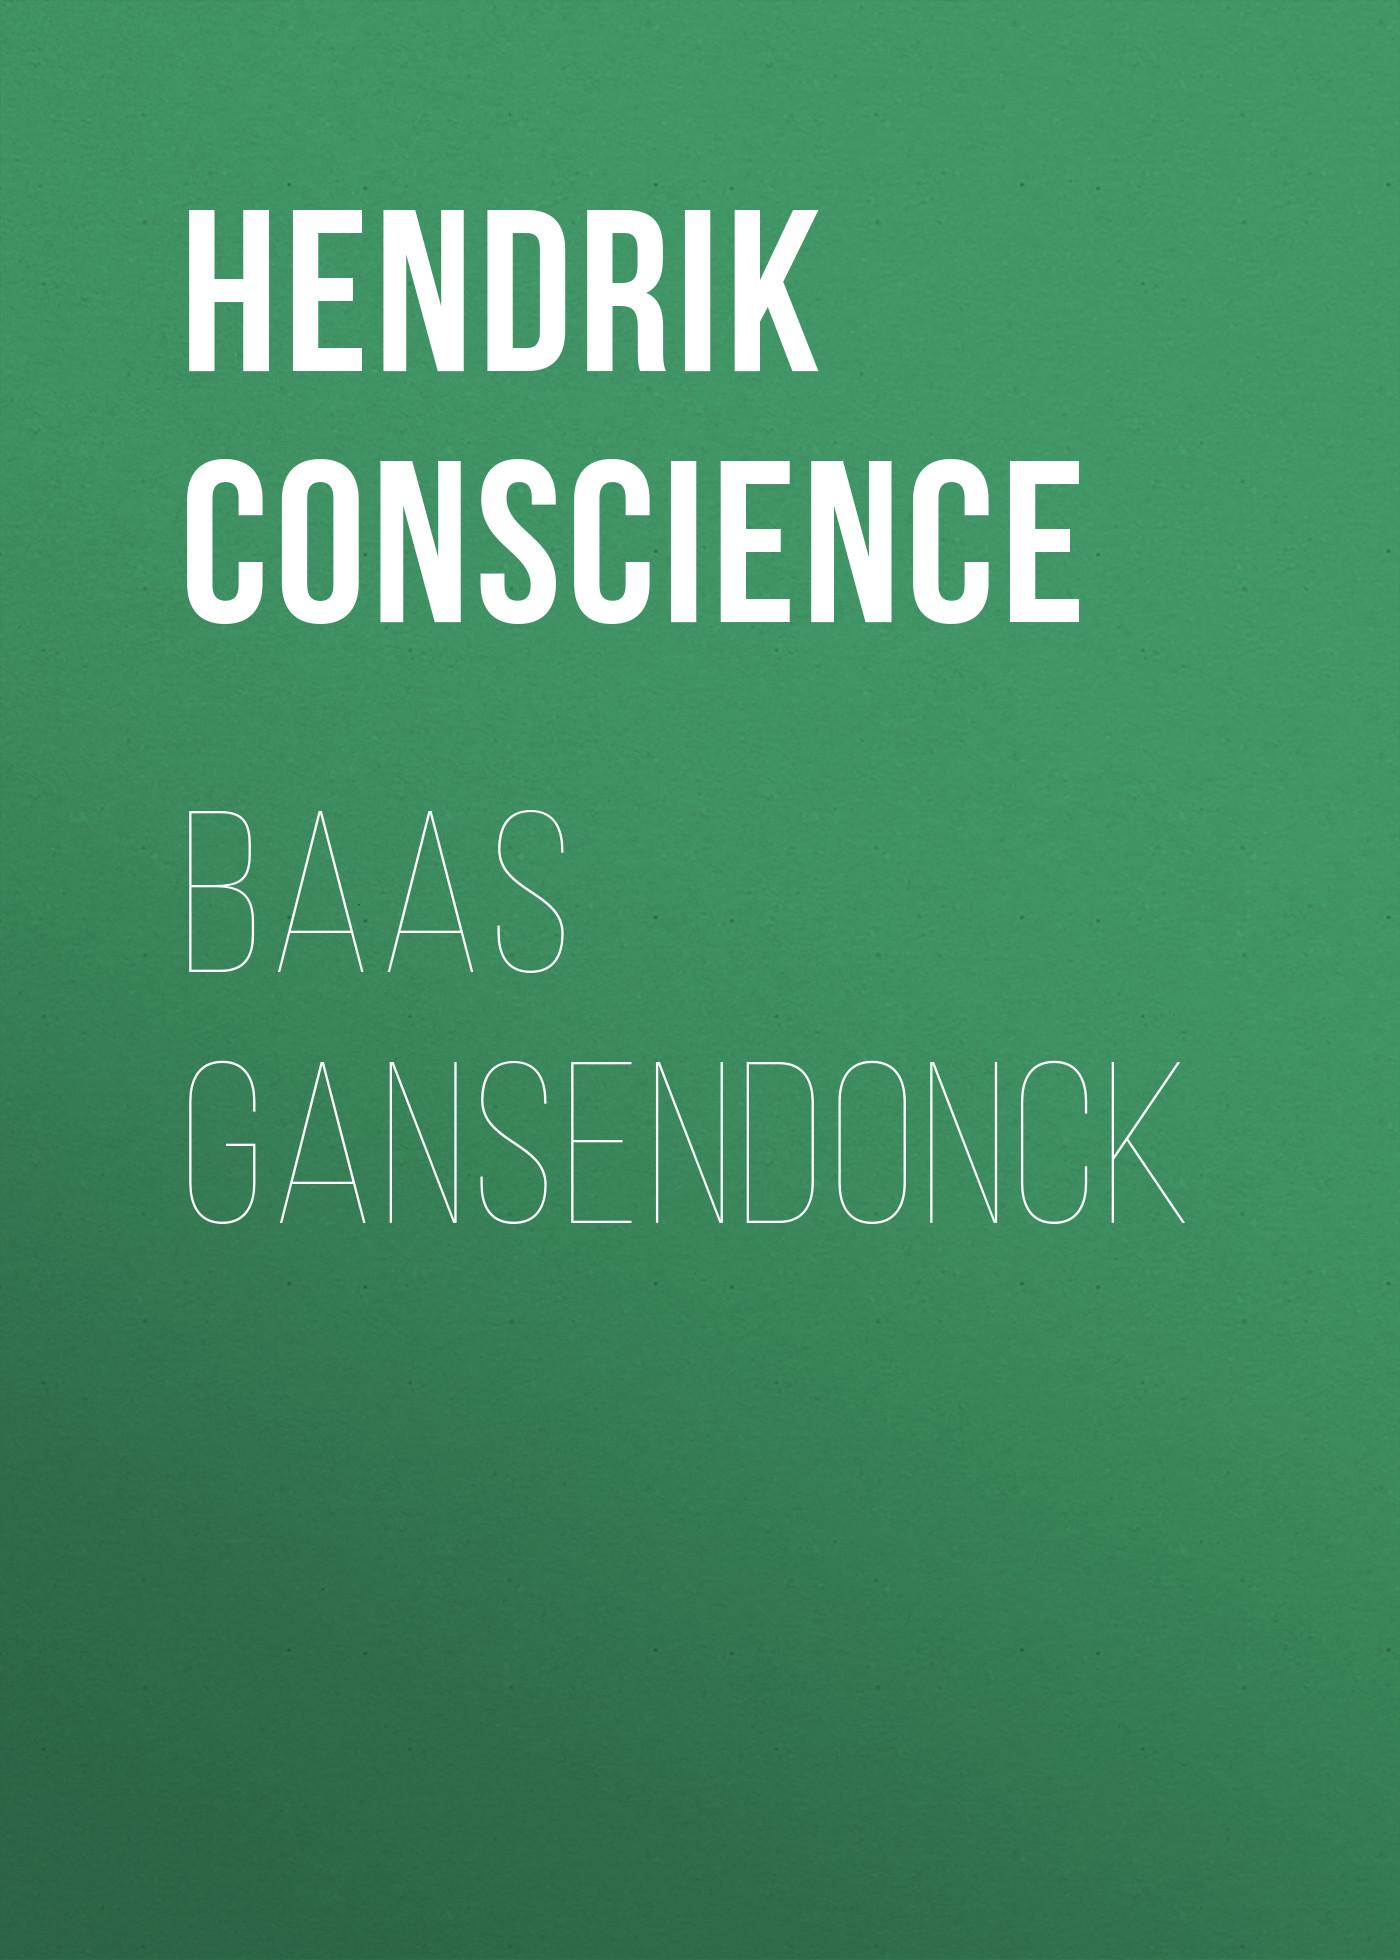 Hendrik Conscience Baas Gansendonck ilves toomas hendrik suurem eesti